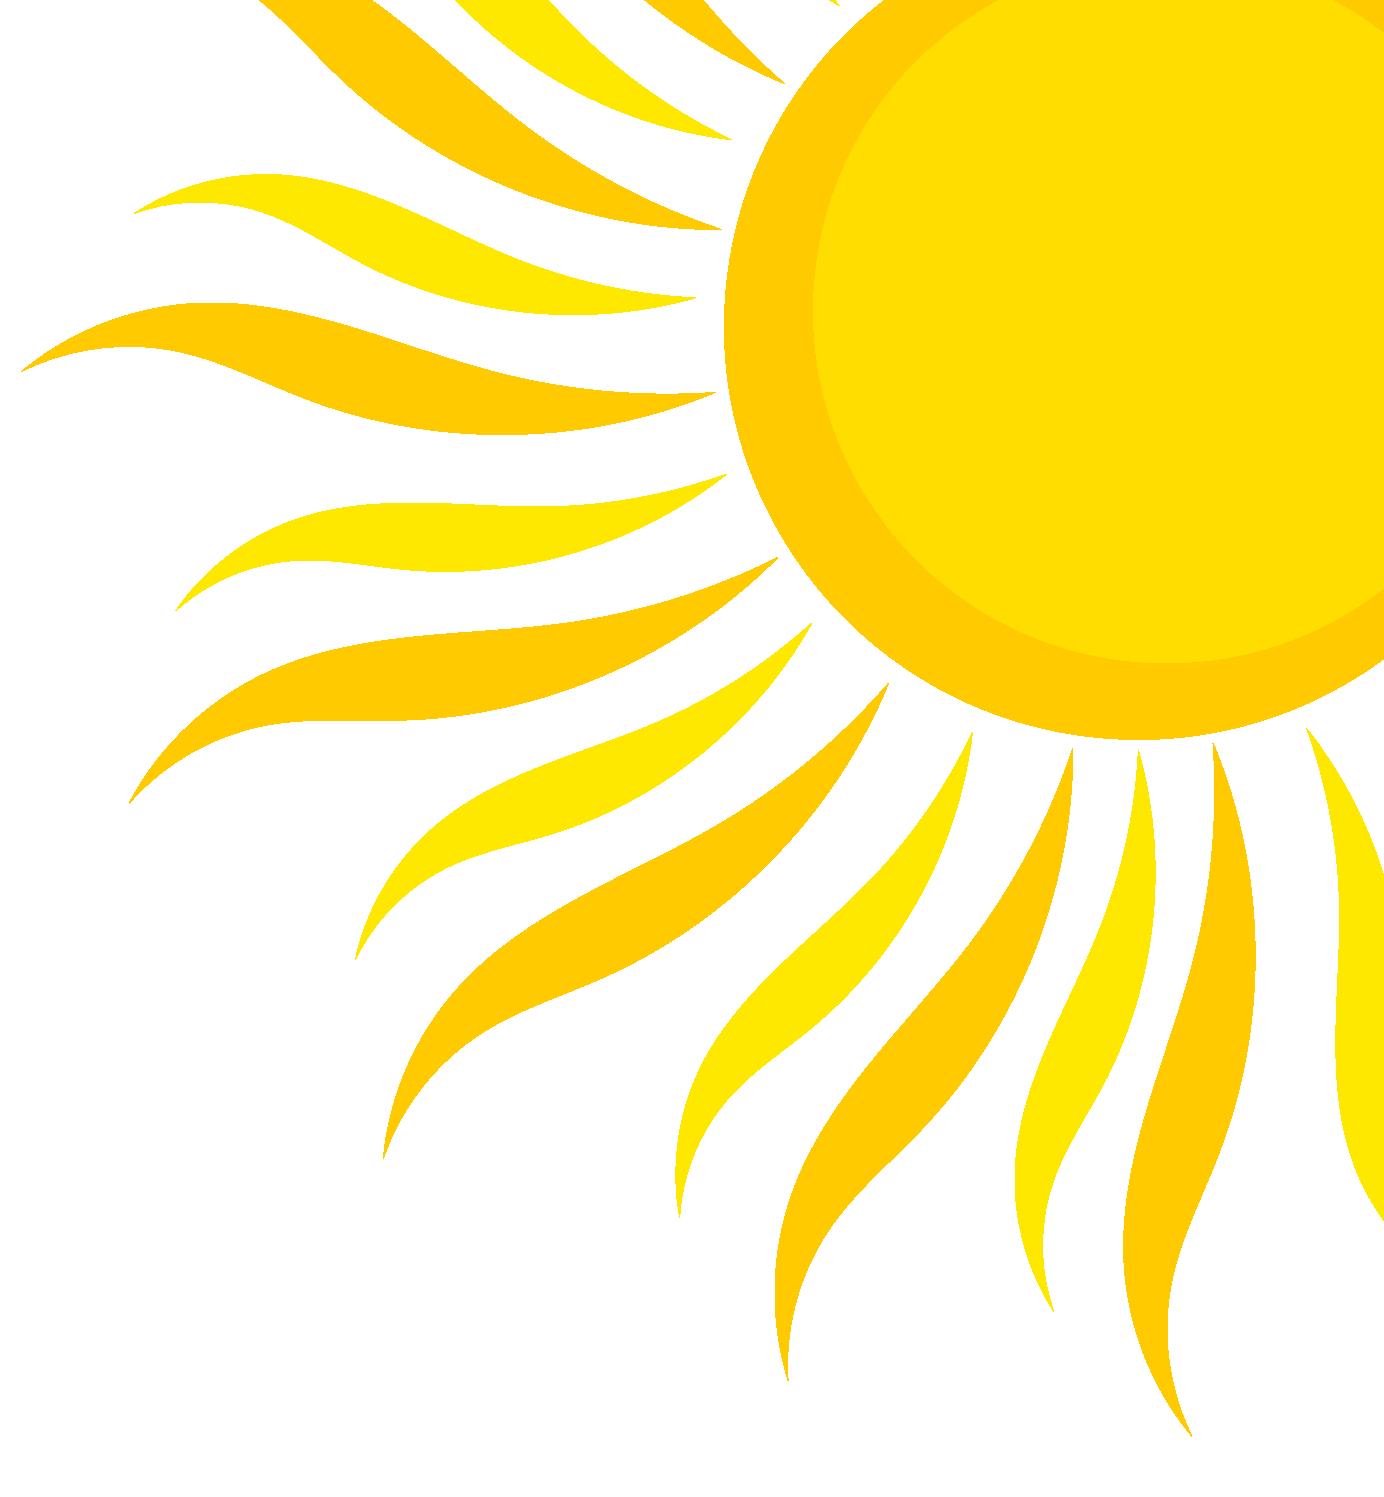 Clipart sun wave. Graphic chalkboard pinterest seasons